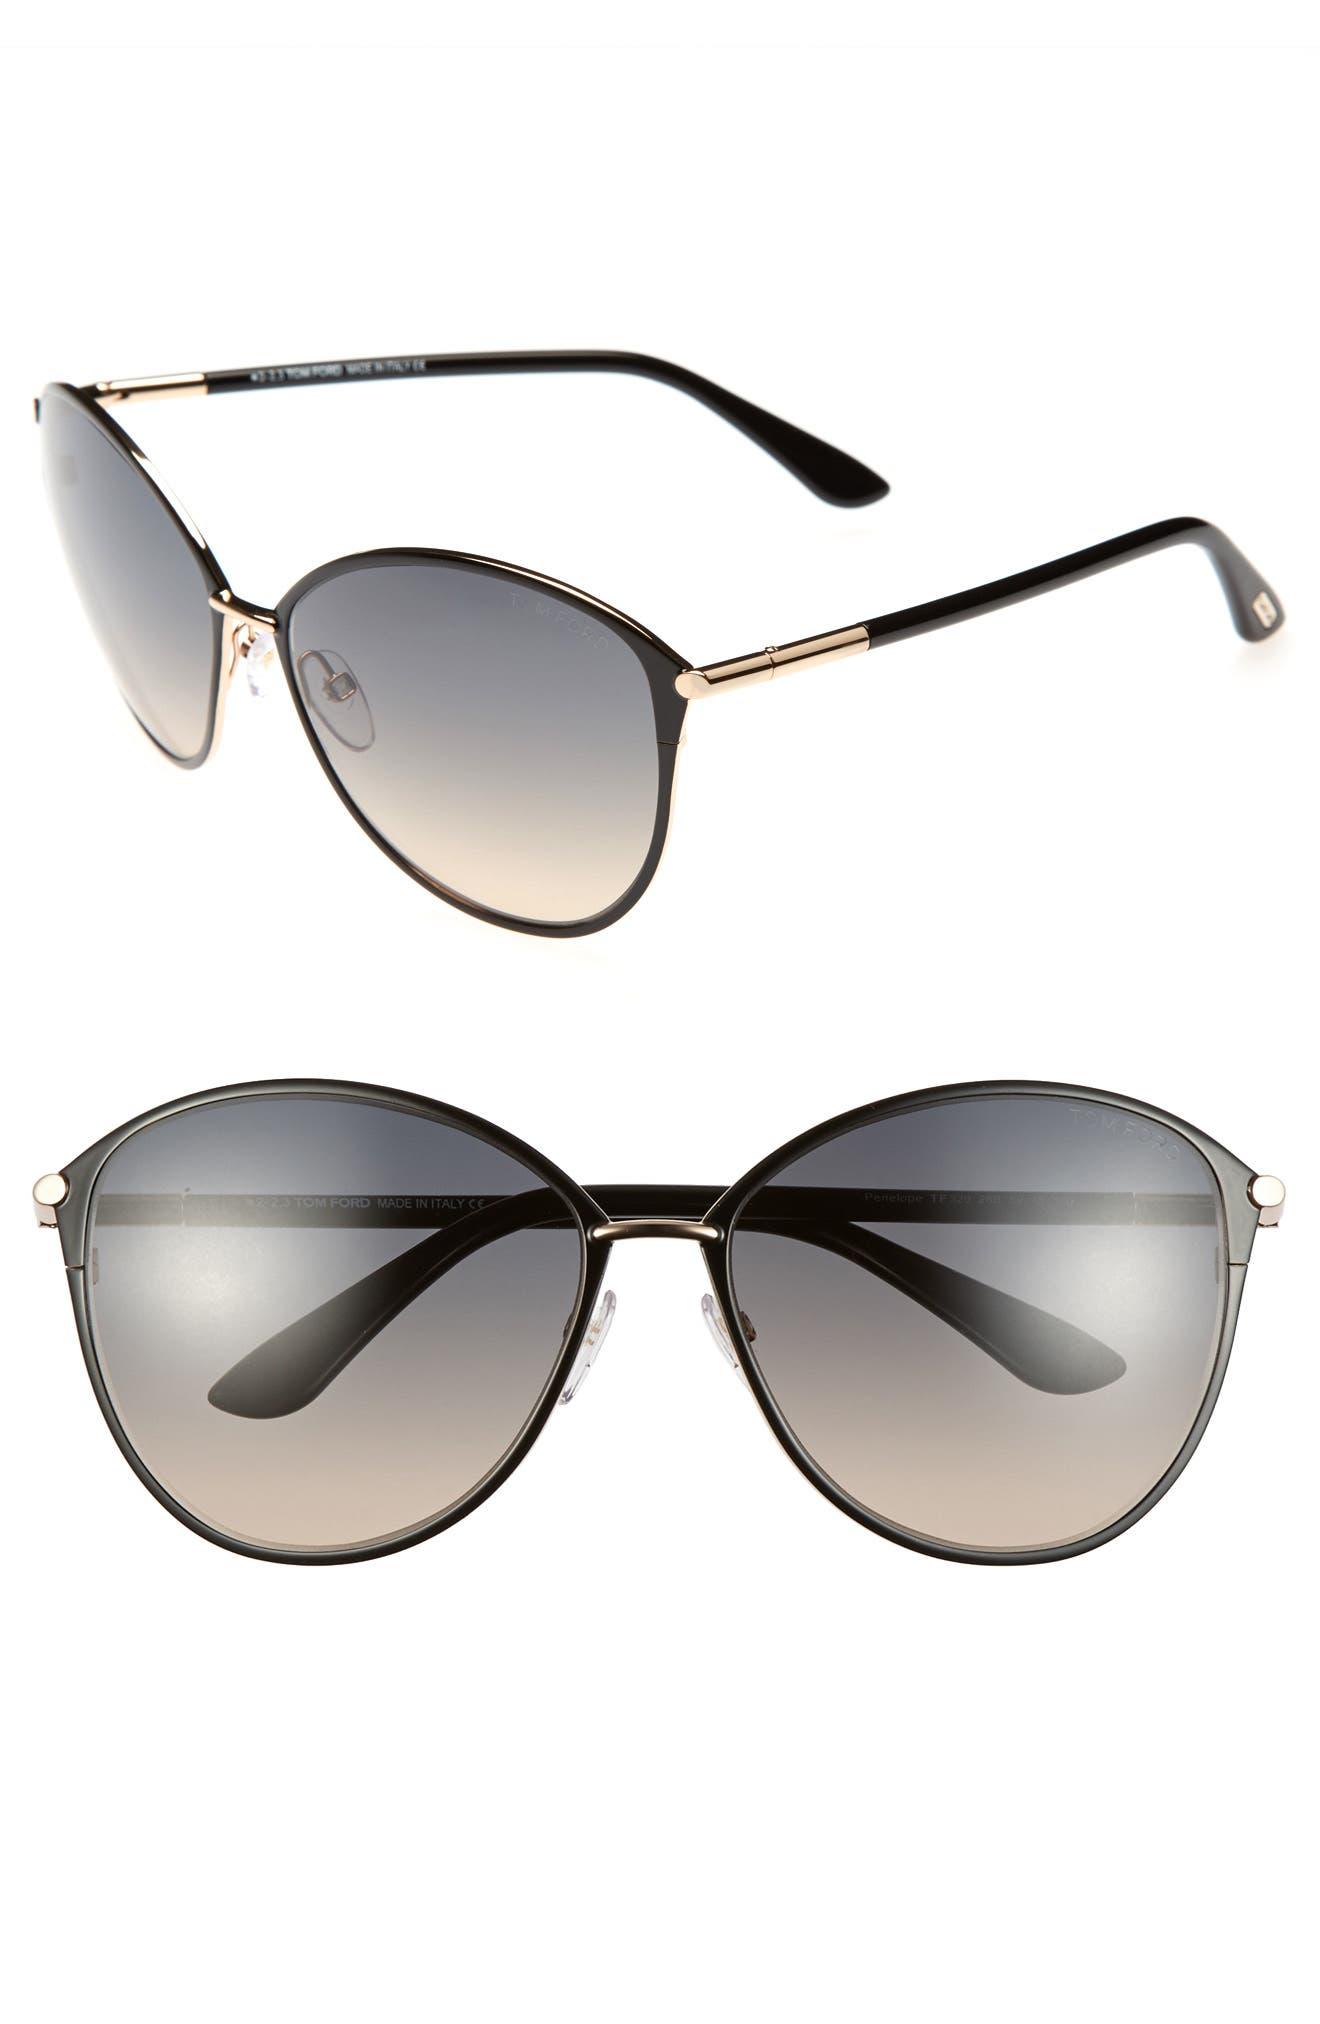 Penelope 59mm Gradient Cat Eye Sunglasses,                             Main thumbnail 1, color,                             SHINY ROSE GOLD/ BLACK